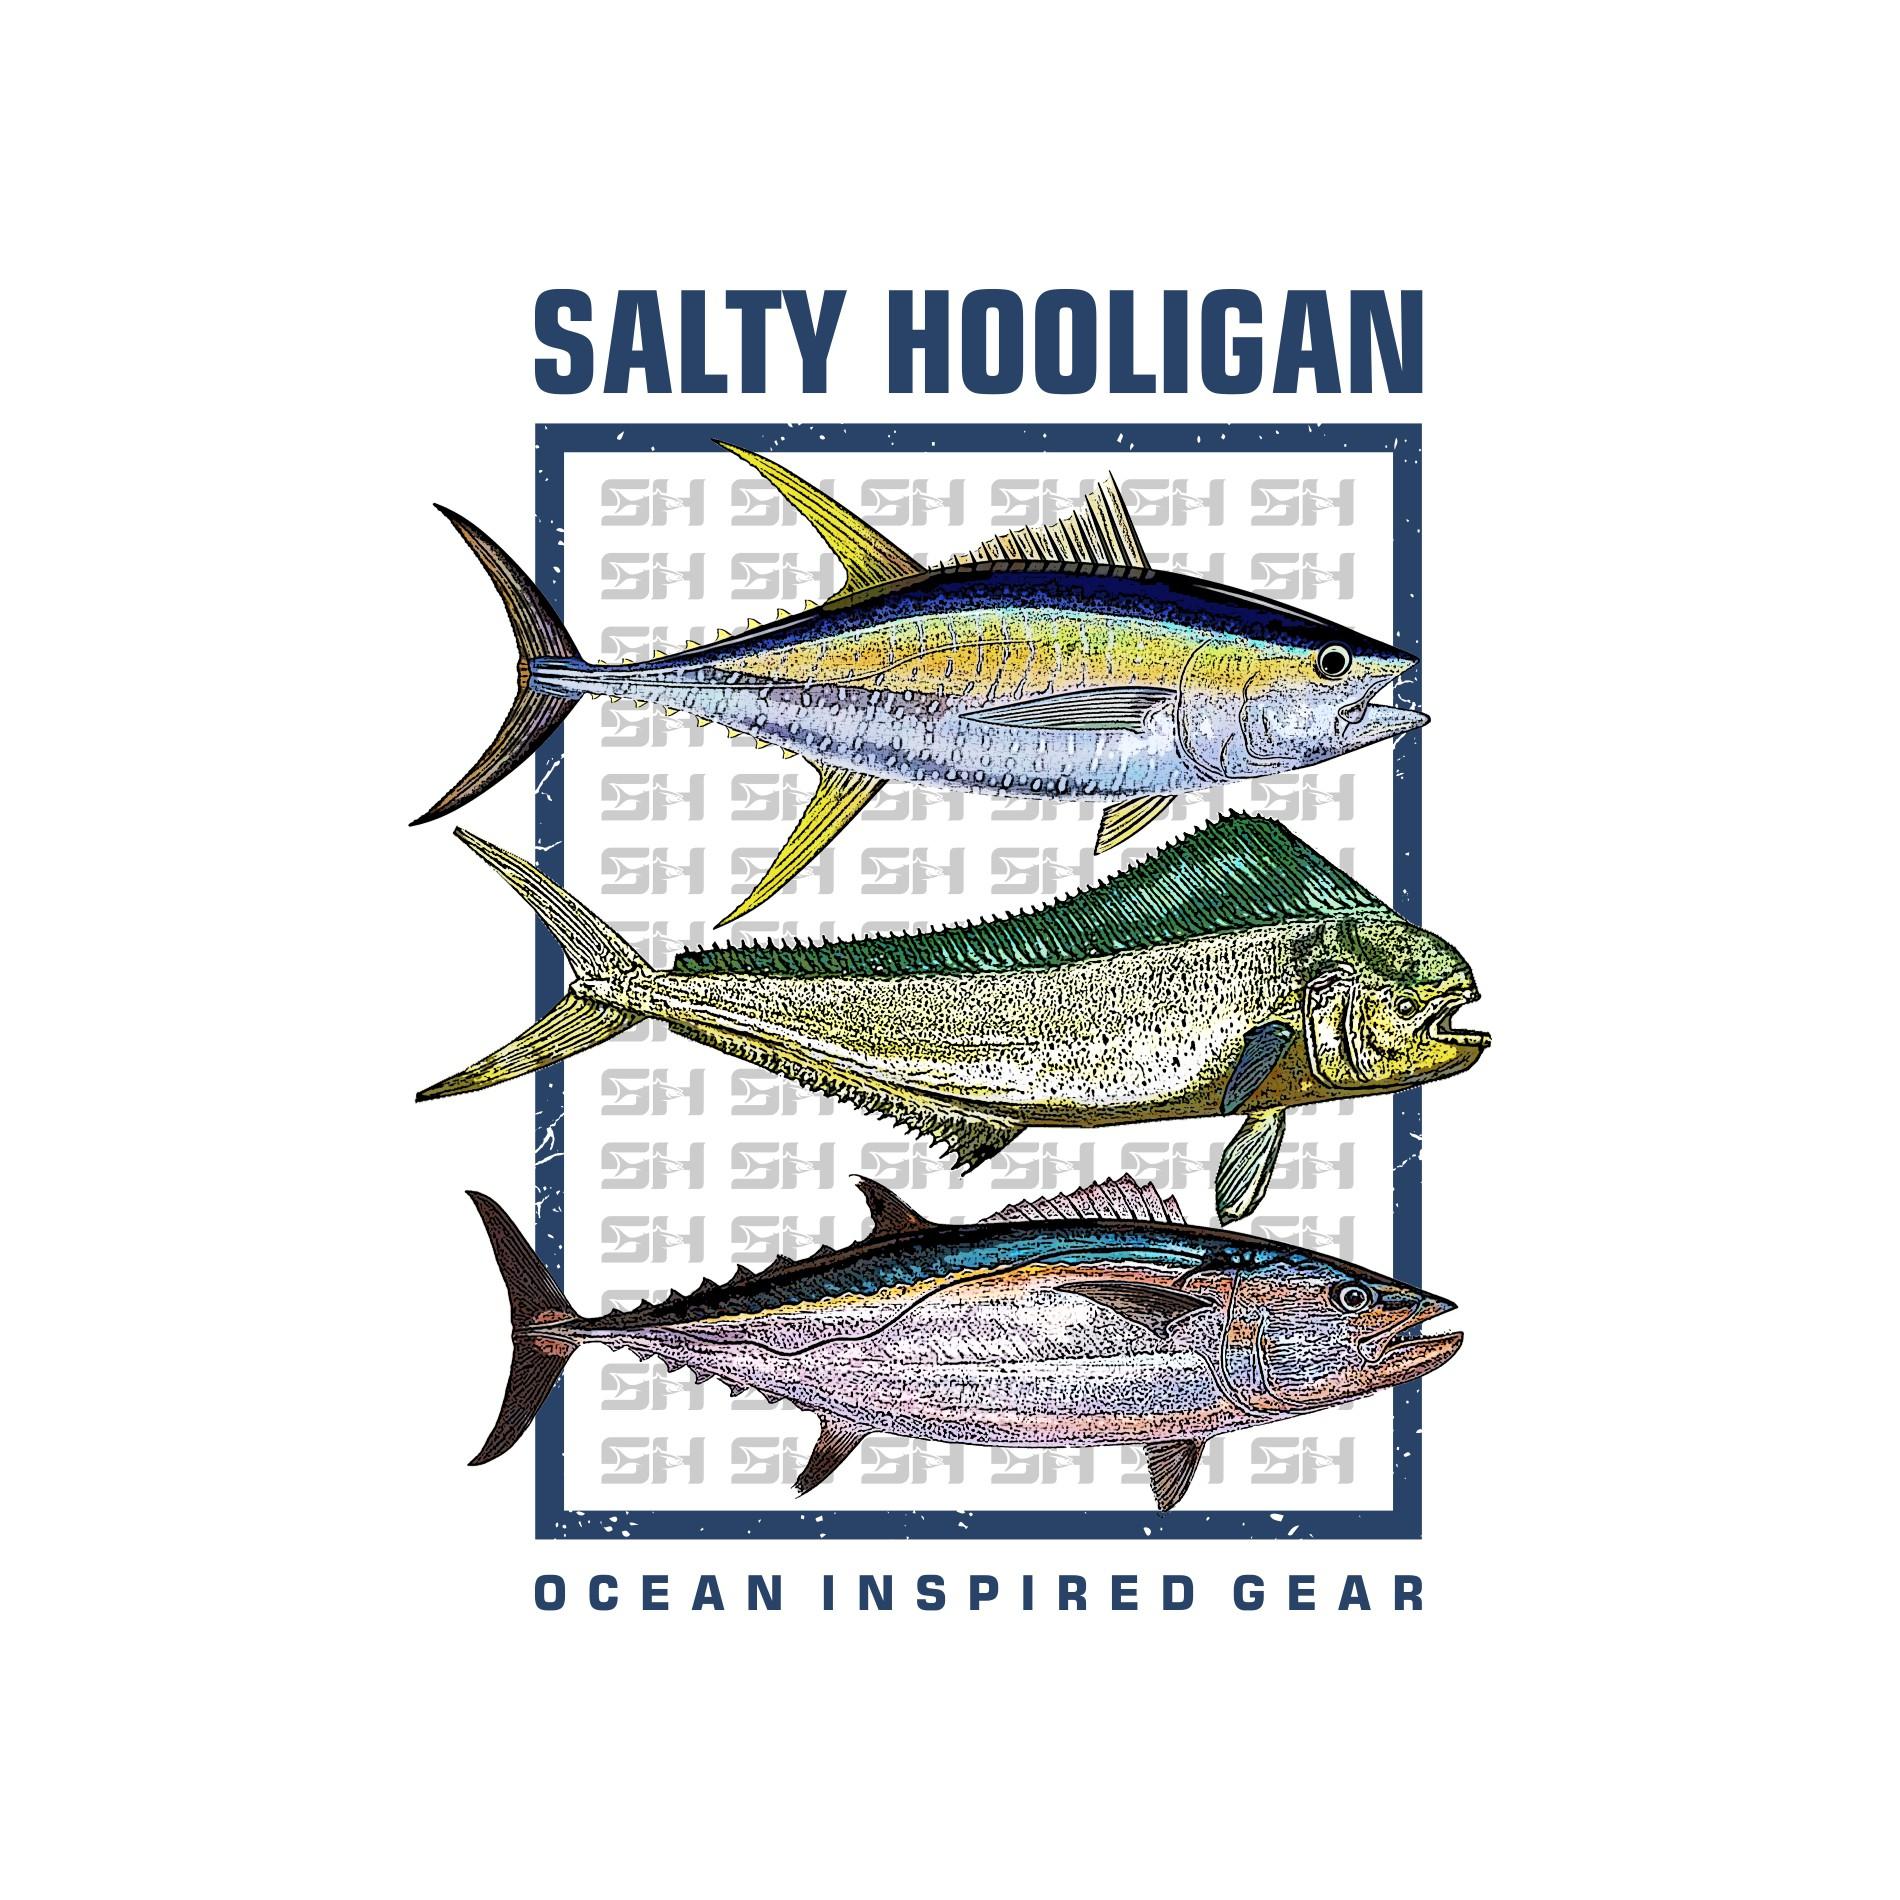 New designs for Salty hooligan